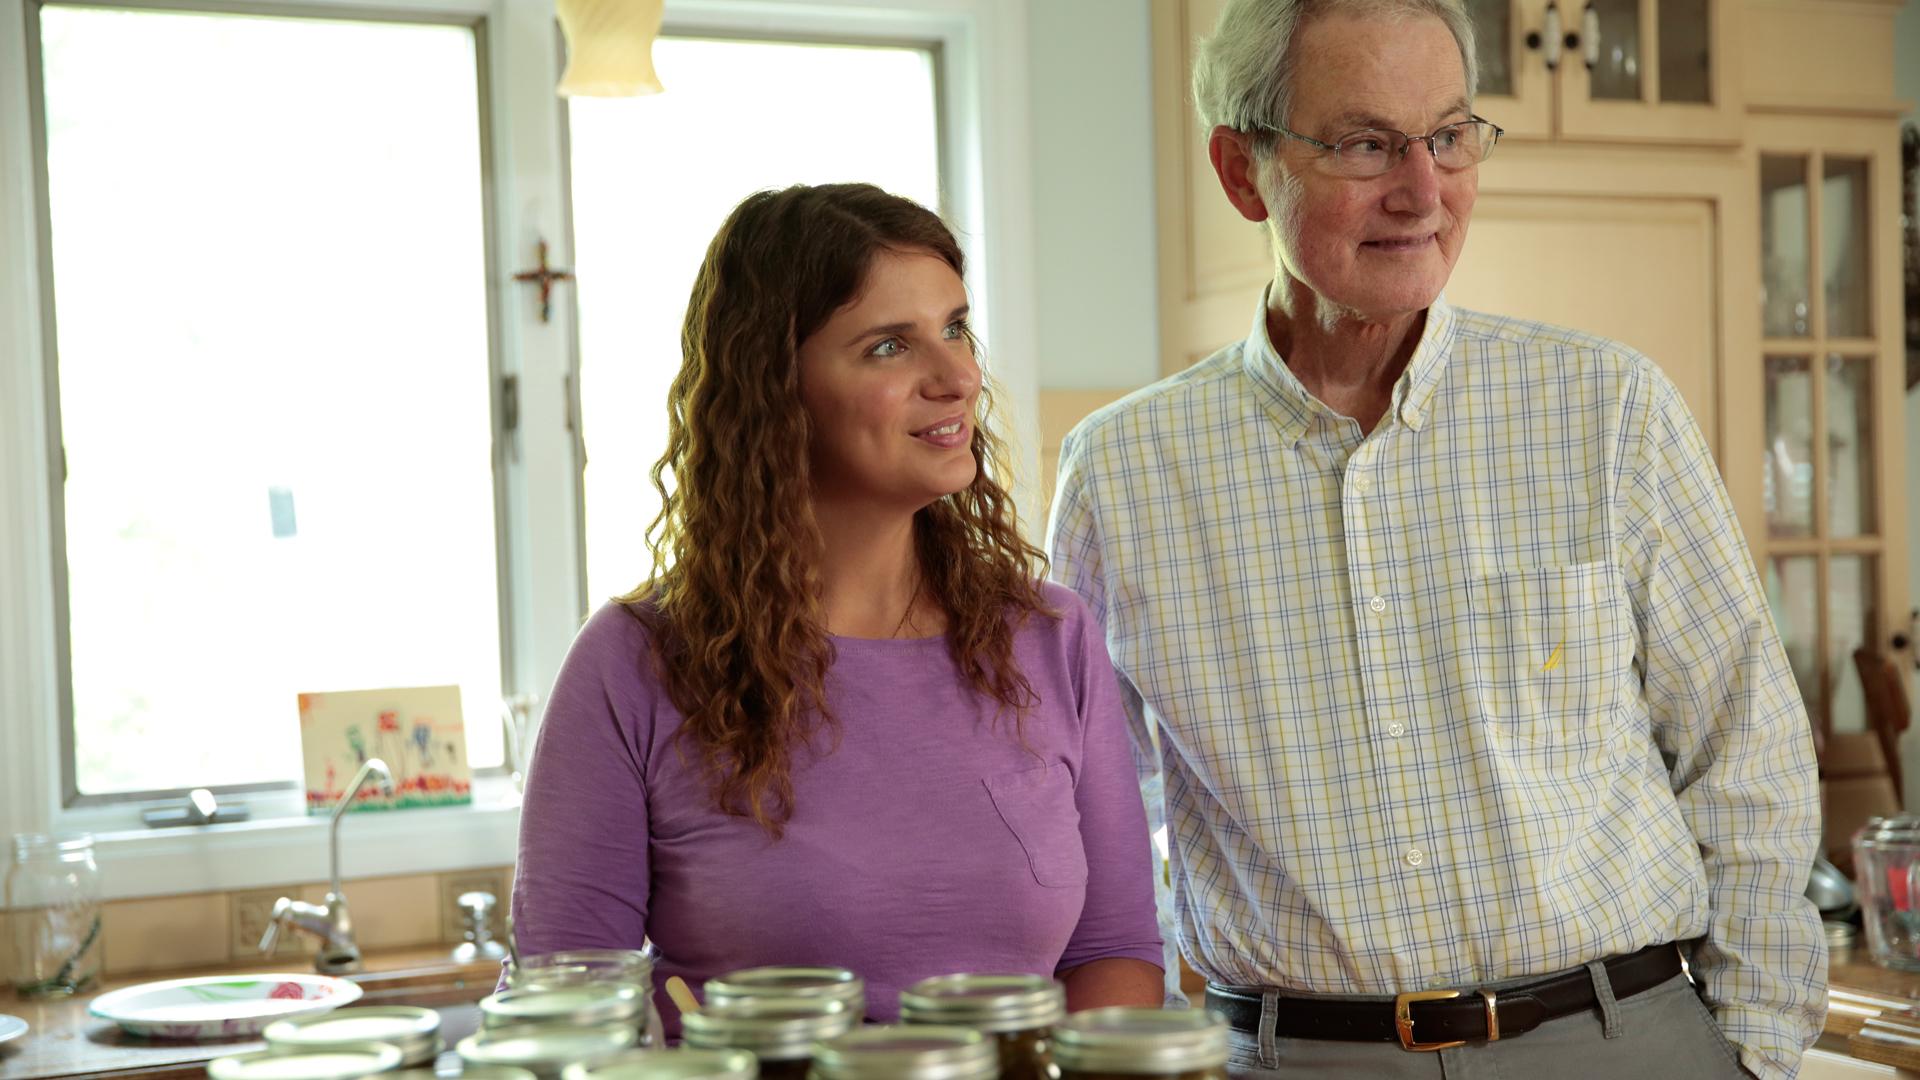 A Chef's Life - Season 3, Episode 4: Pickle Perfect